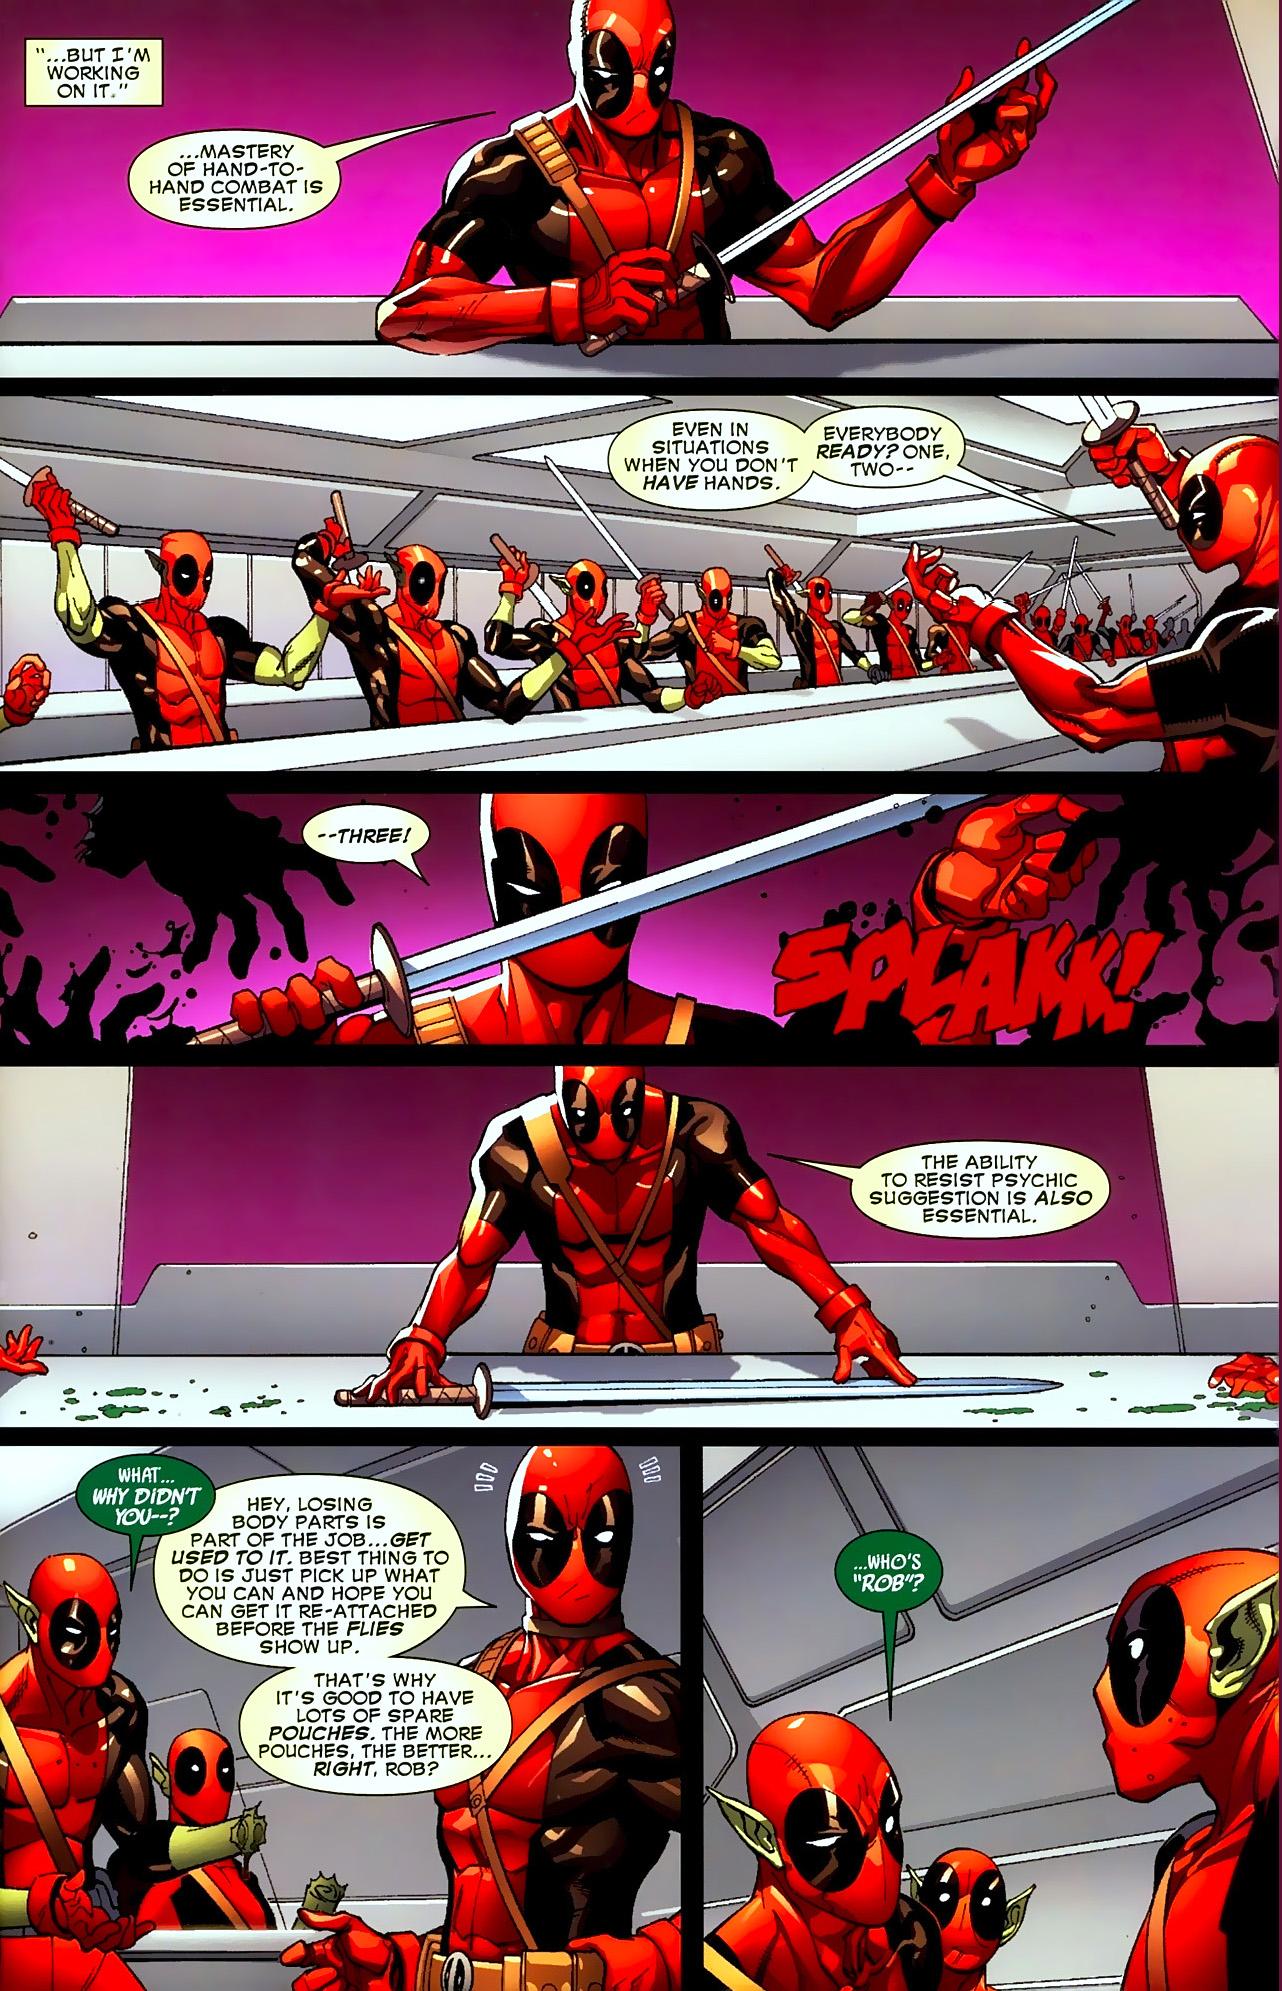 deadpool trains his deadpool-type super-skrulls